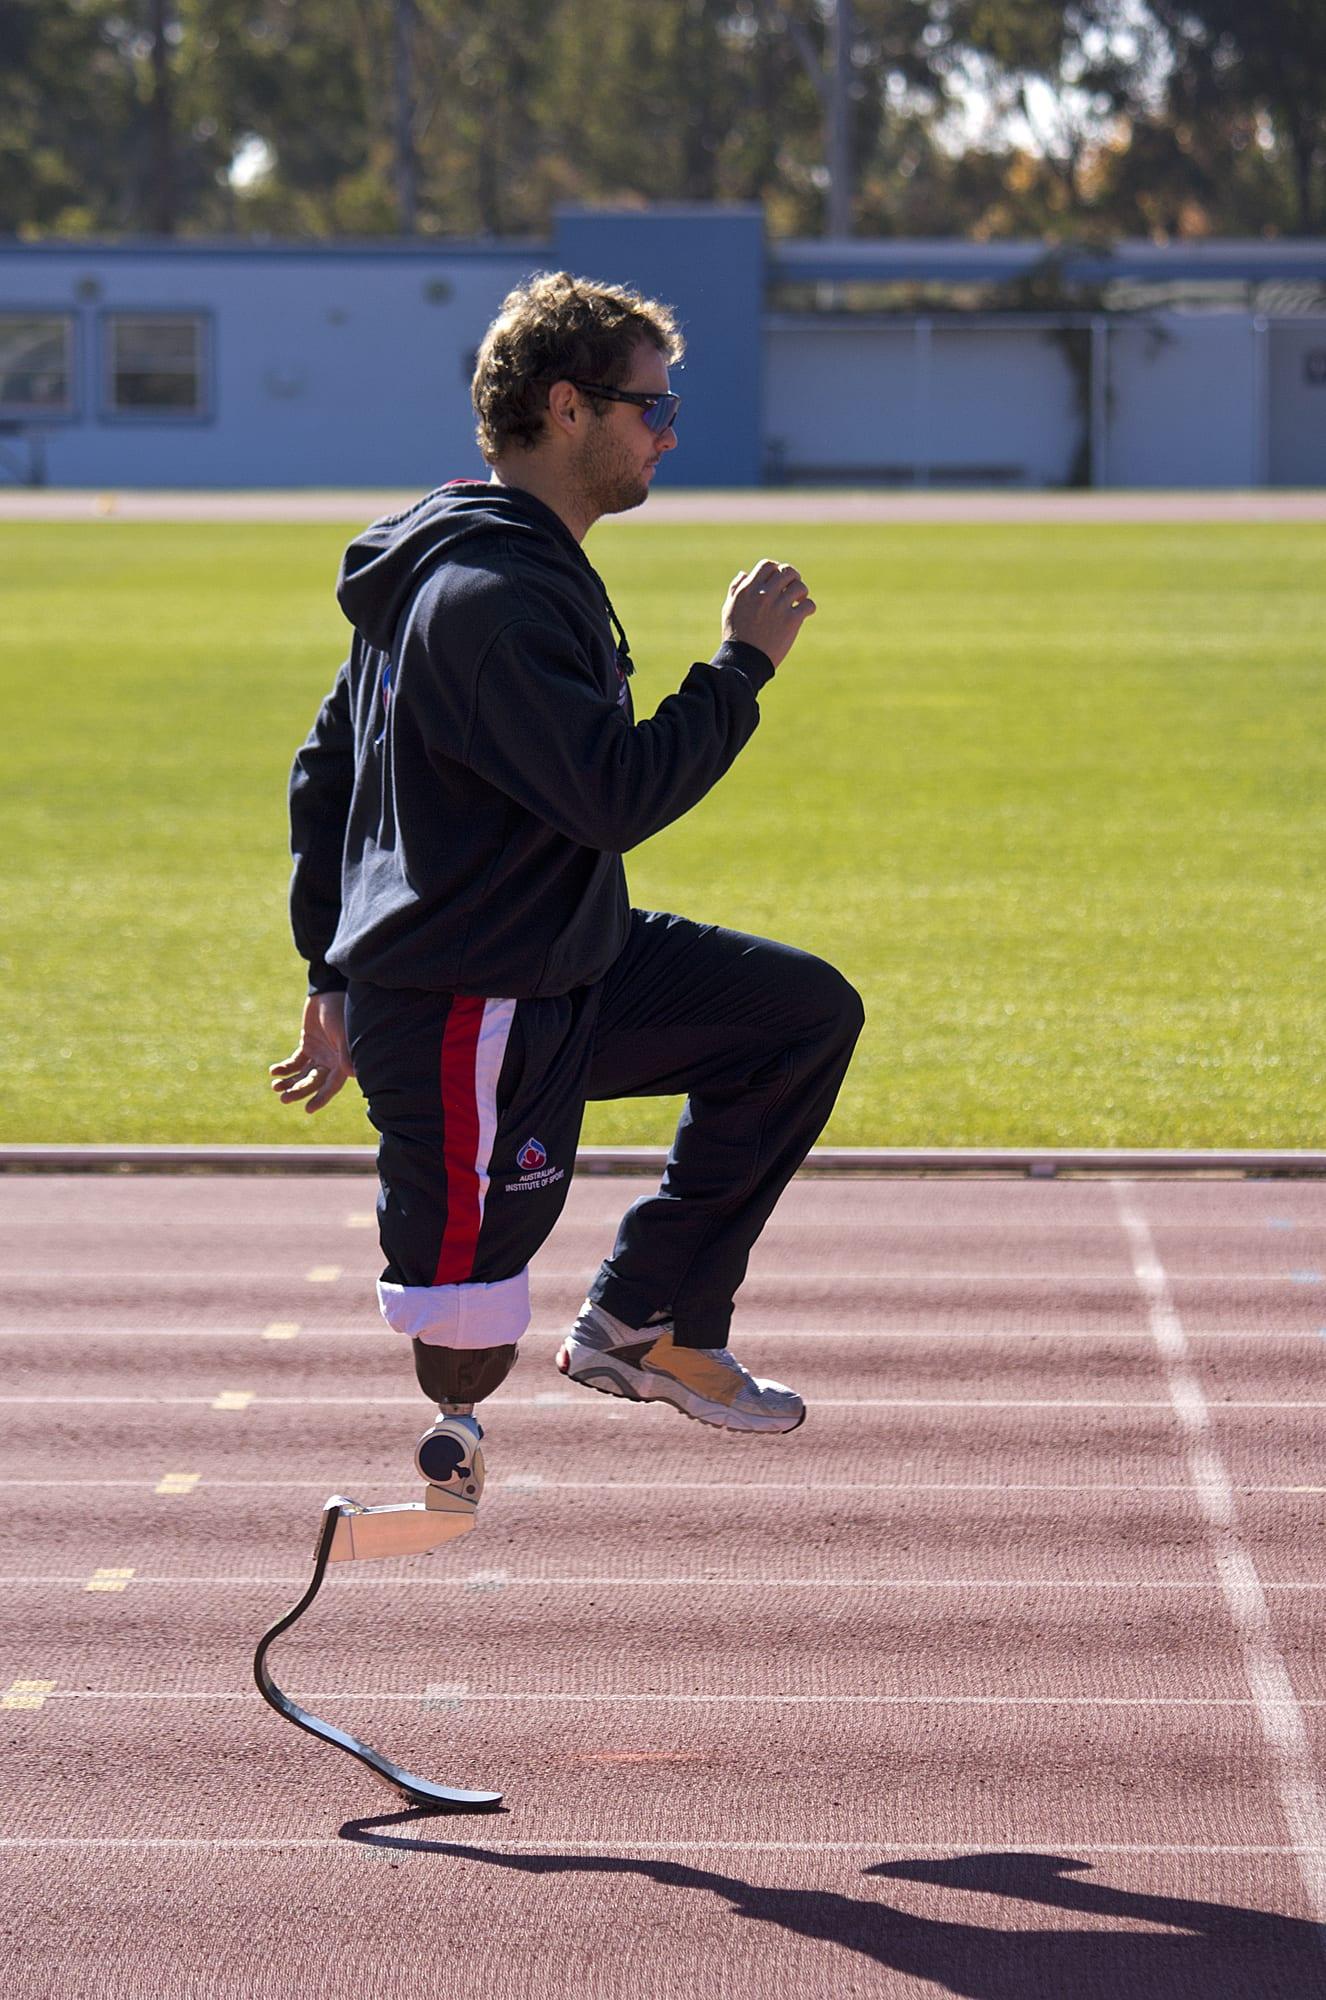 meet the athletes paralympics 2015